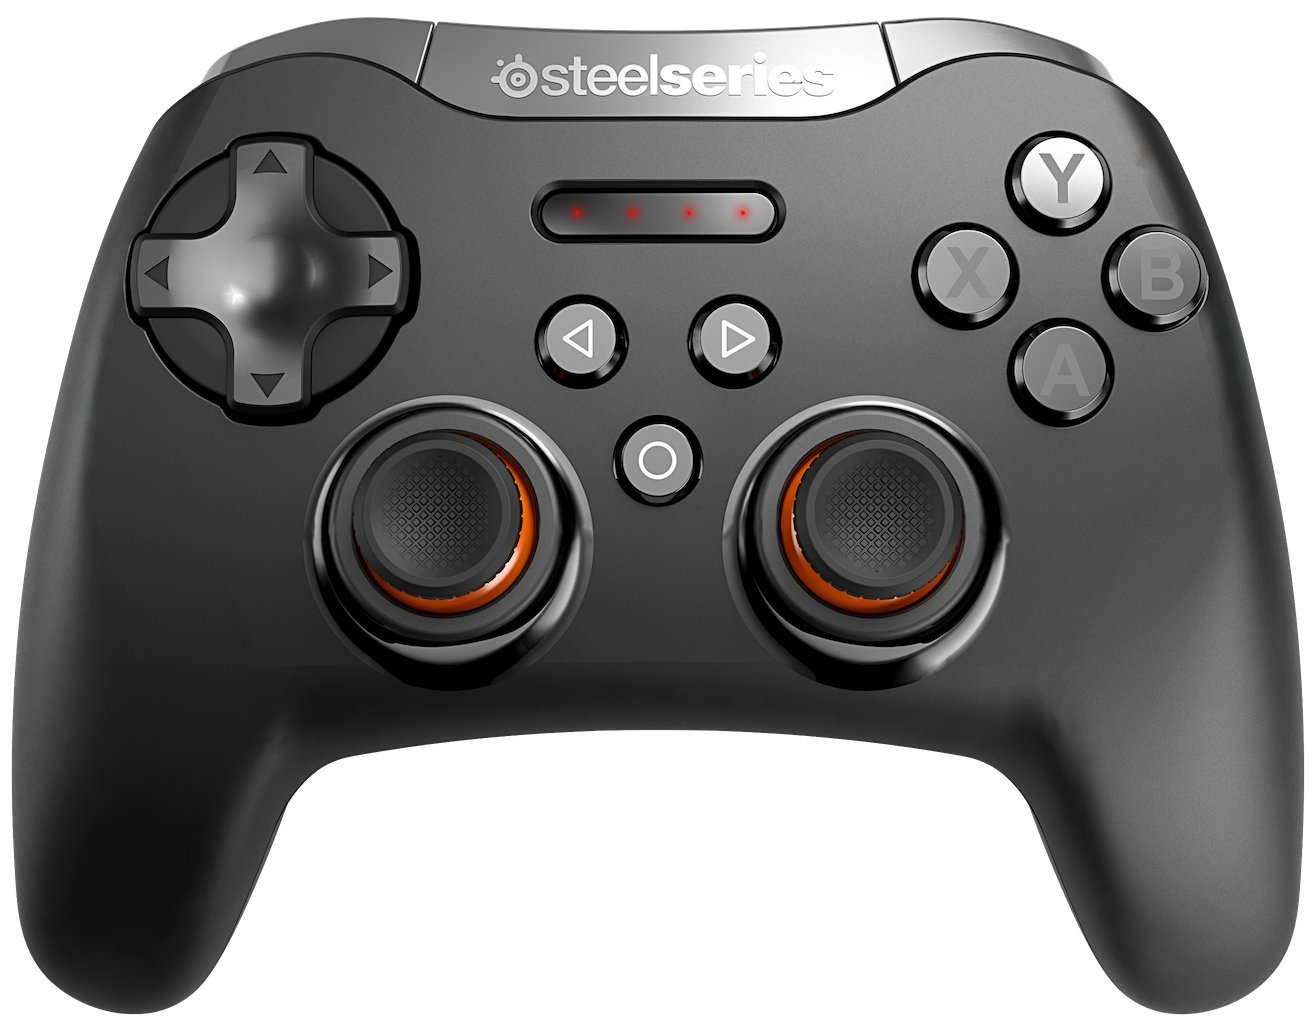 SteelSeries Stratus XL, Contrôleur Gaming sans fil, Bluetooth, 14 Boutons, (Windows/Android/Samsung Gear VR/HTC Vive/Oculus) – Noir